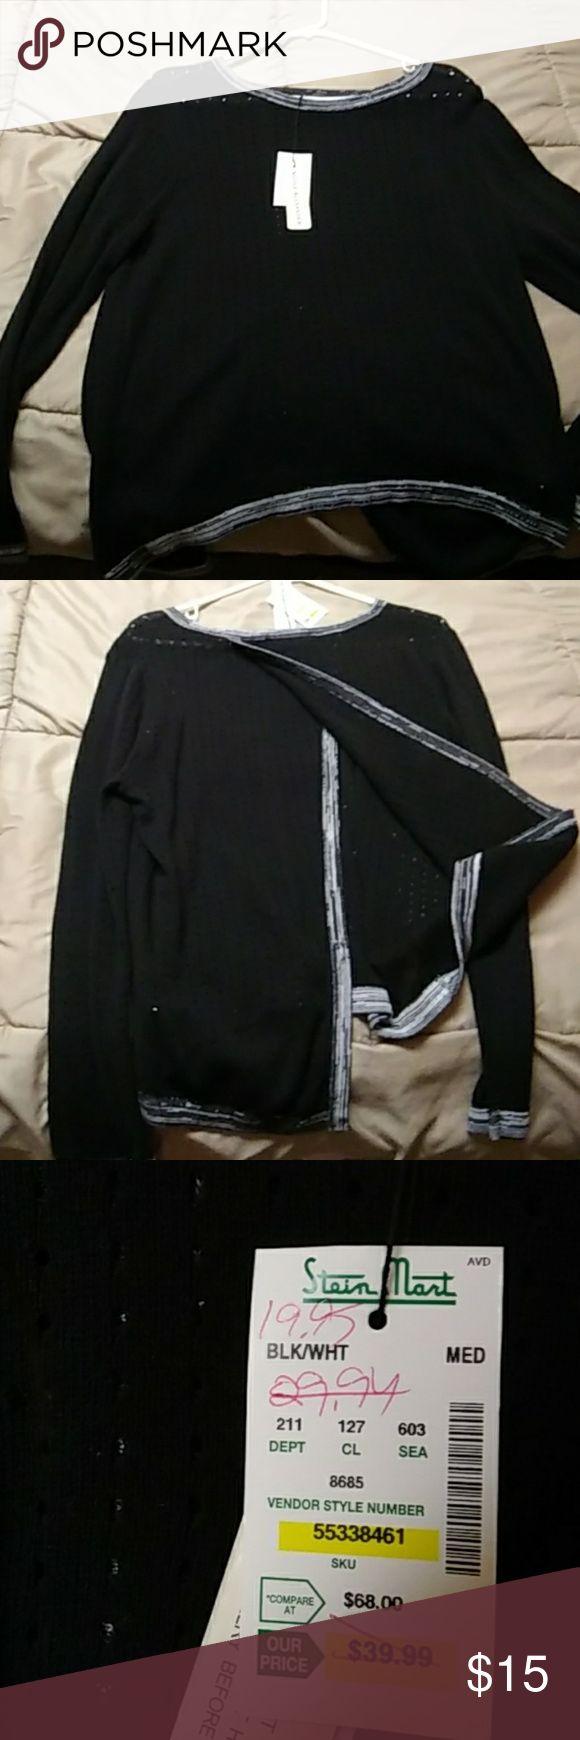 Open back shirt NEVER WORN nicole alexander Tops Tees - Long Sleeve